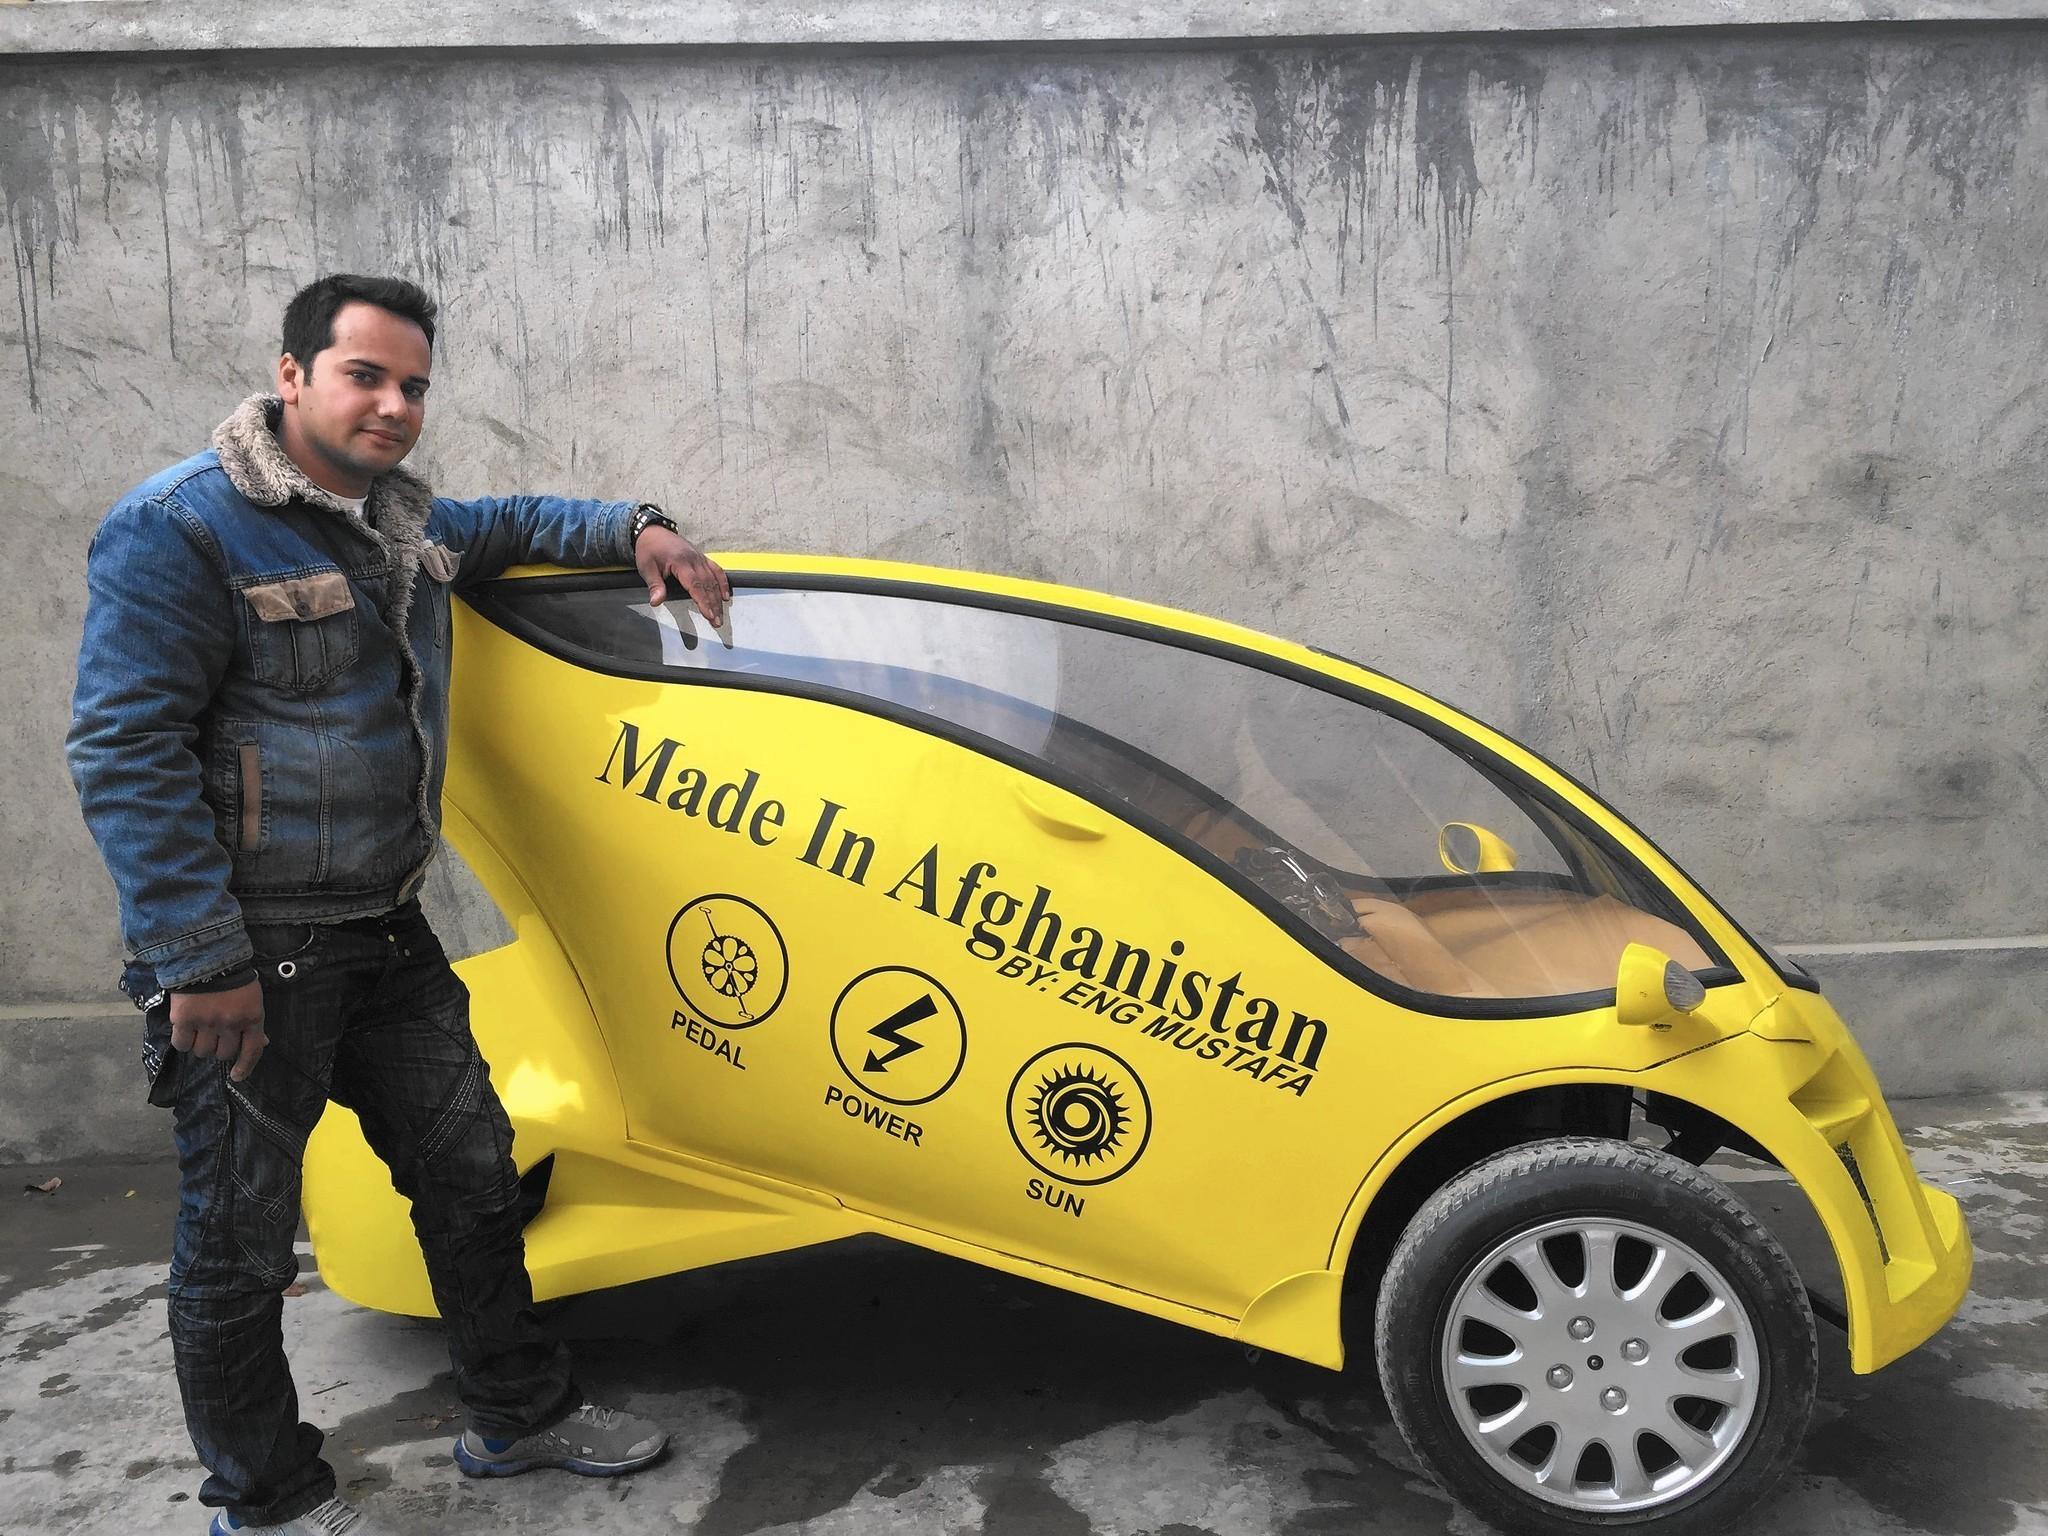 la-fg-afghanistan-solar-bike-20150503